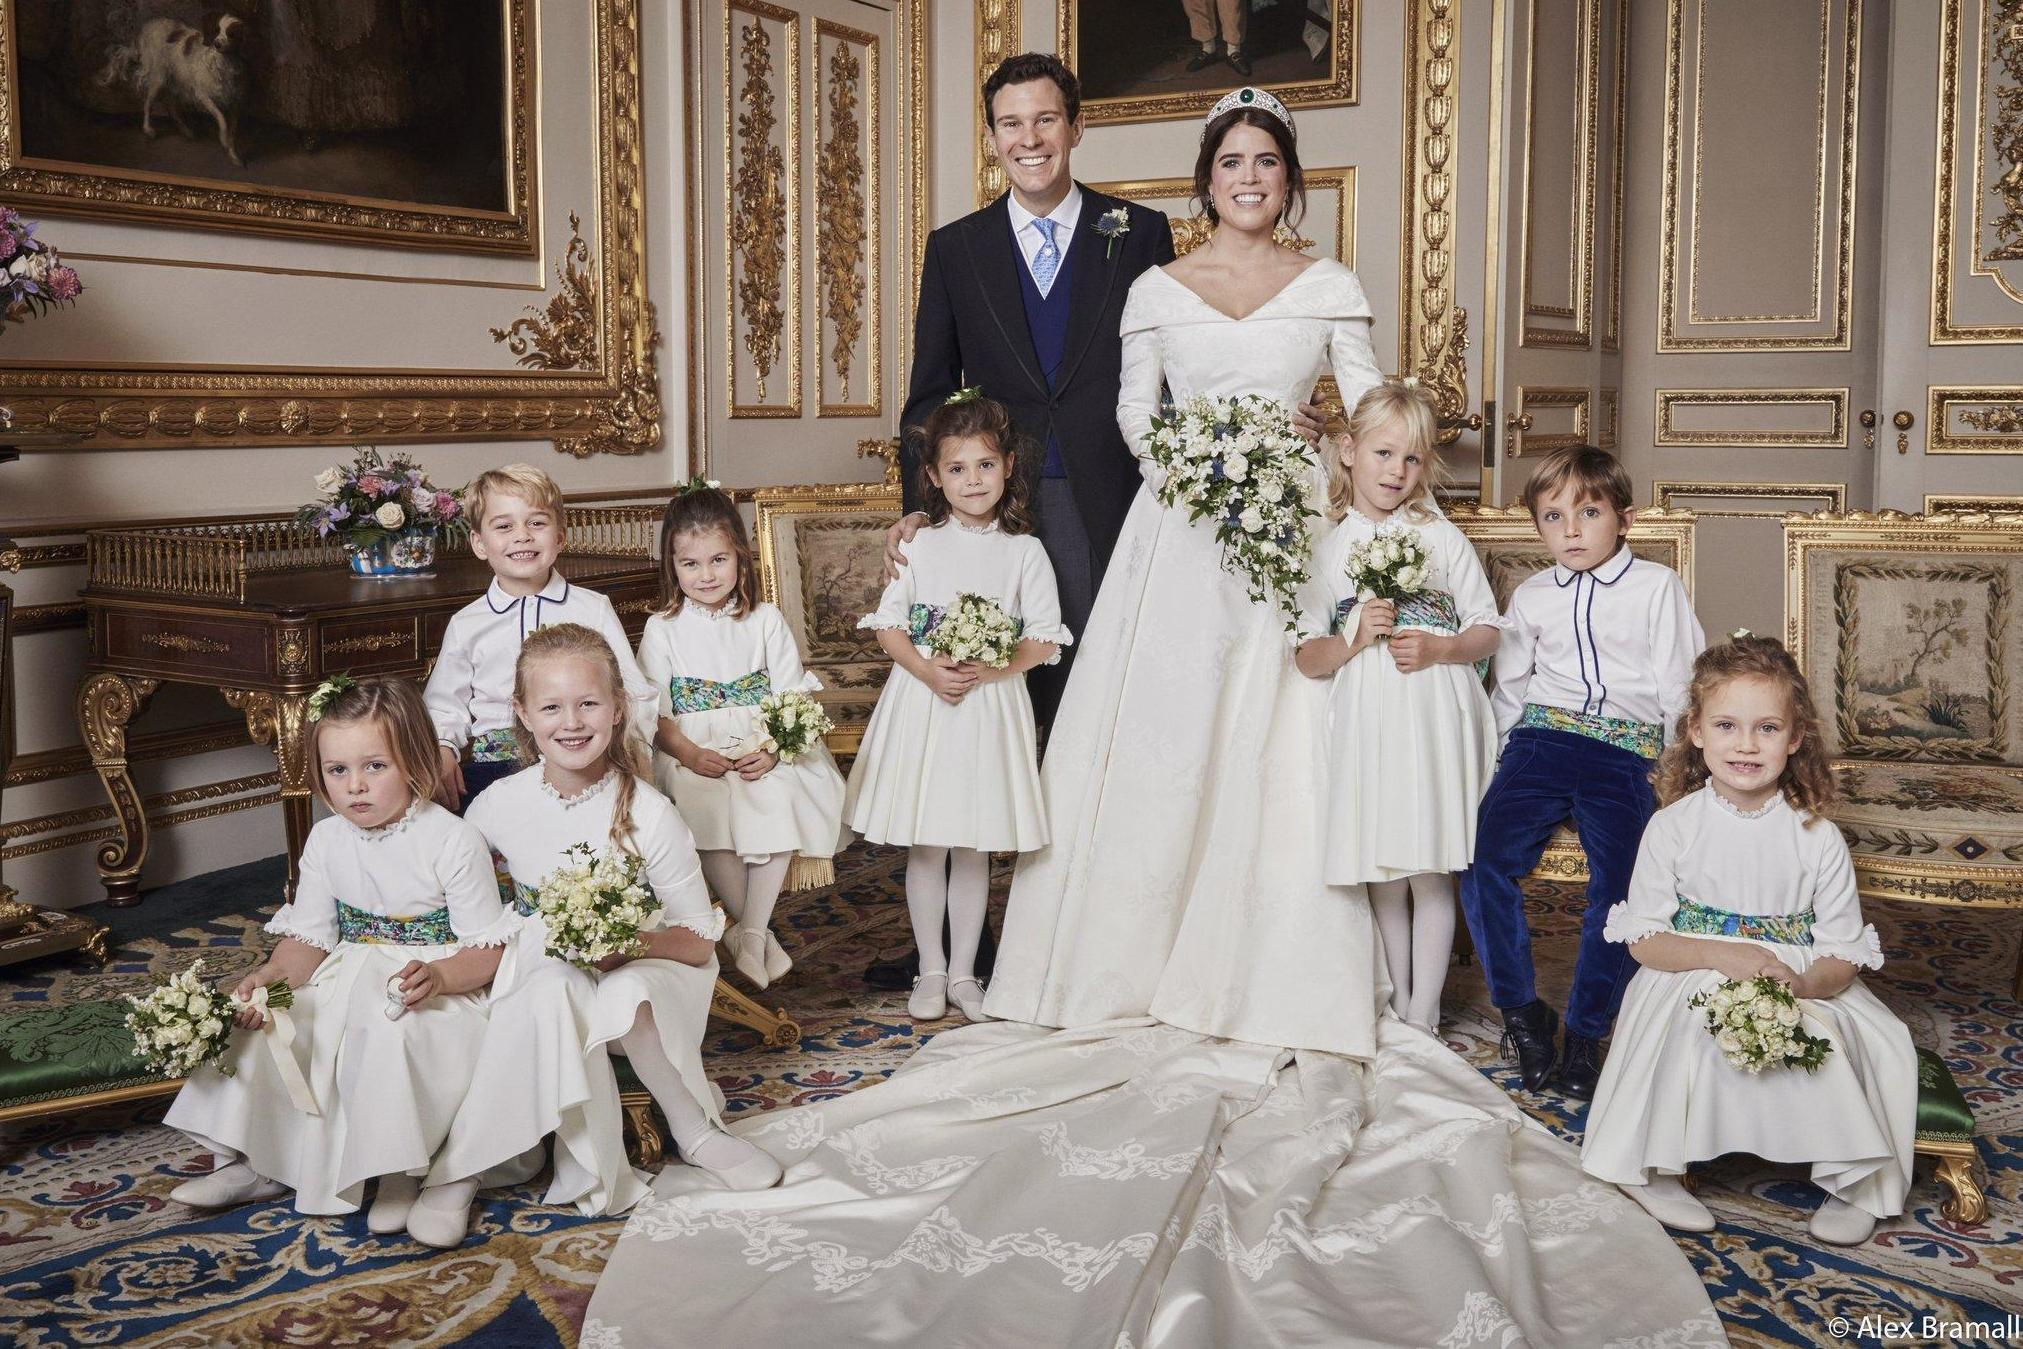 Royal wedding: Princess Eugenie and Jack Brooksbank release official wedding photos